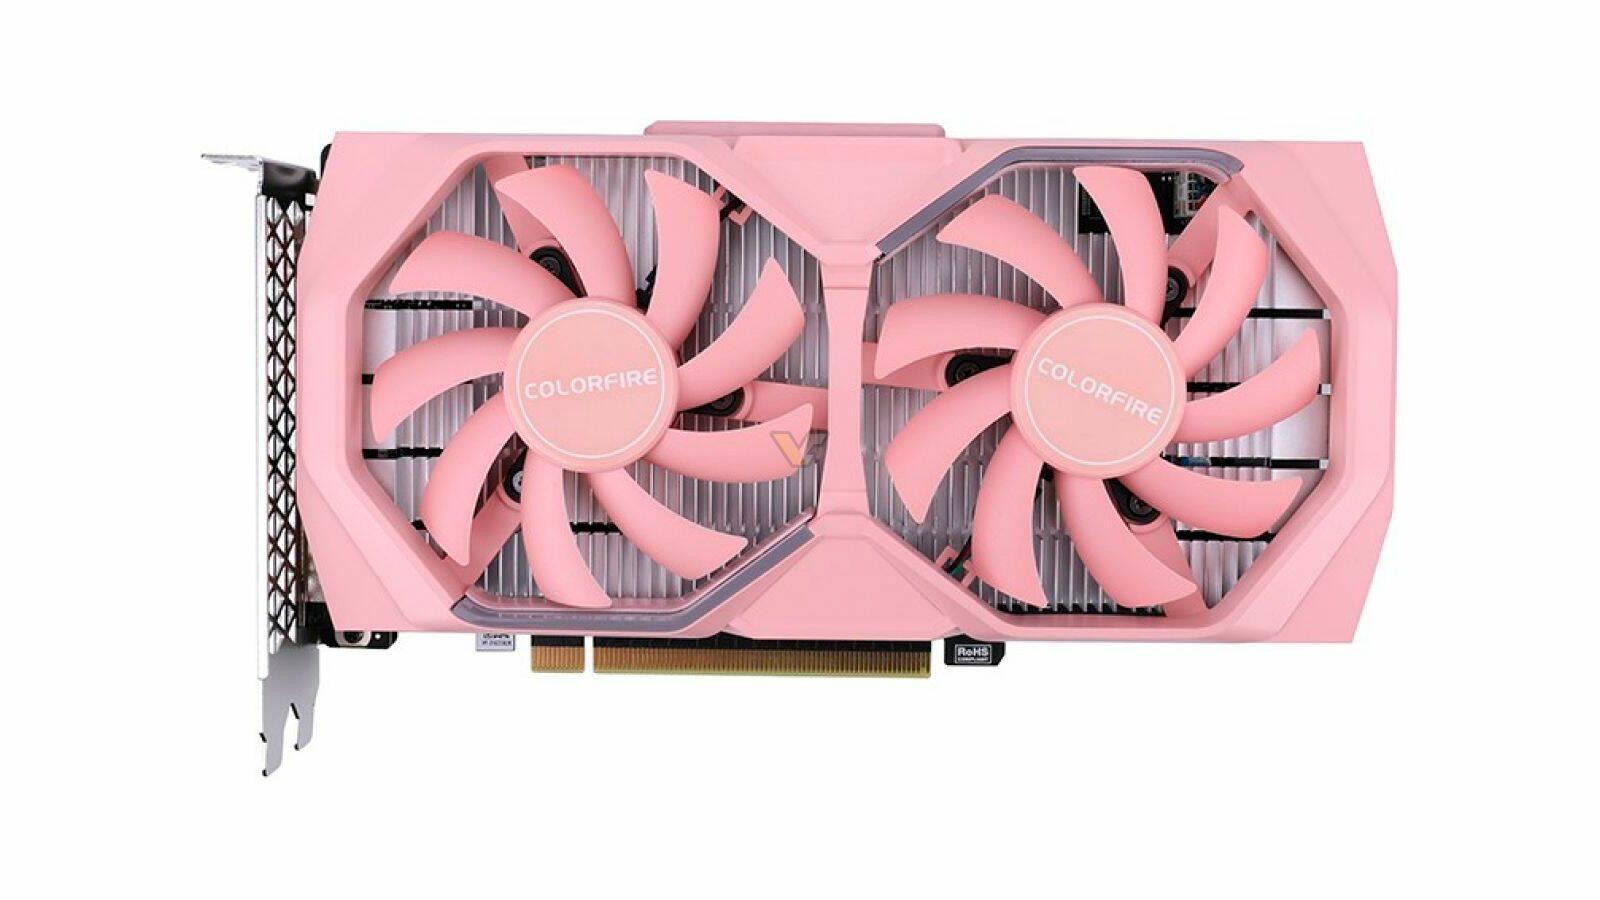 Colorfire GeForce GTX 1660 1650 Super